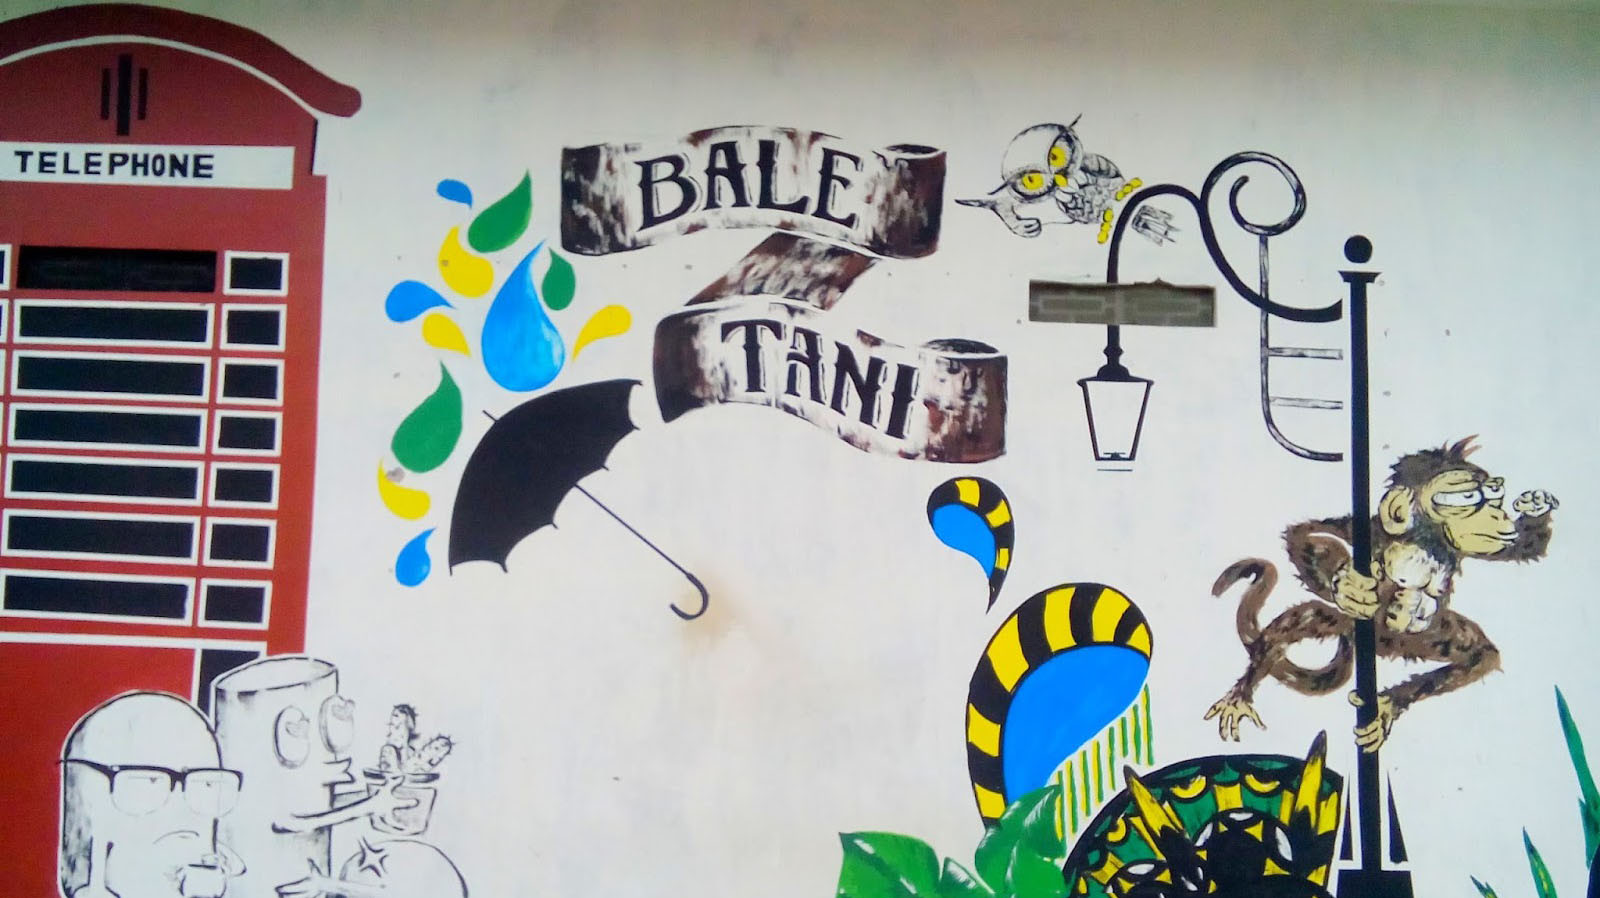 Agrowisata Bale Tani Bareng Jombang Instagramable Abis Kab